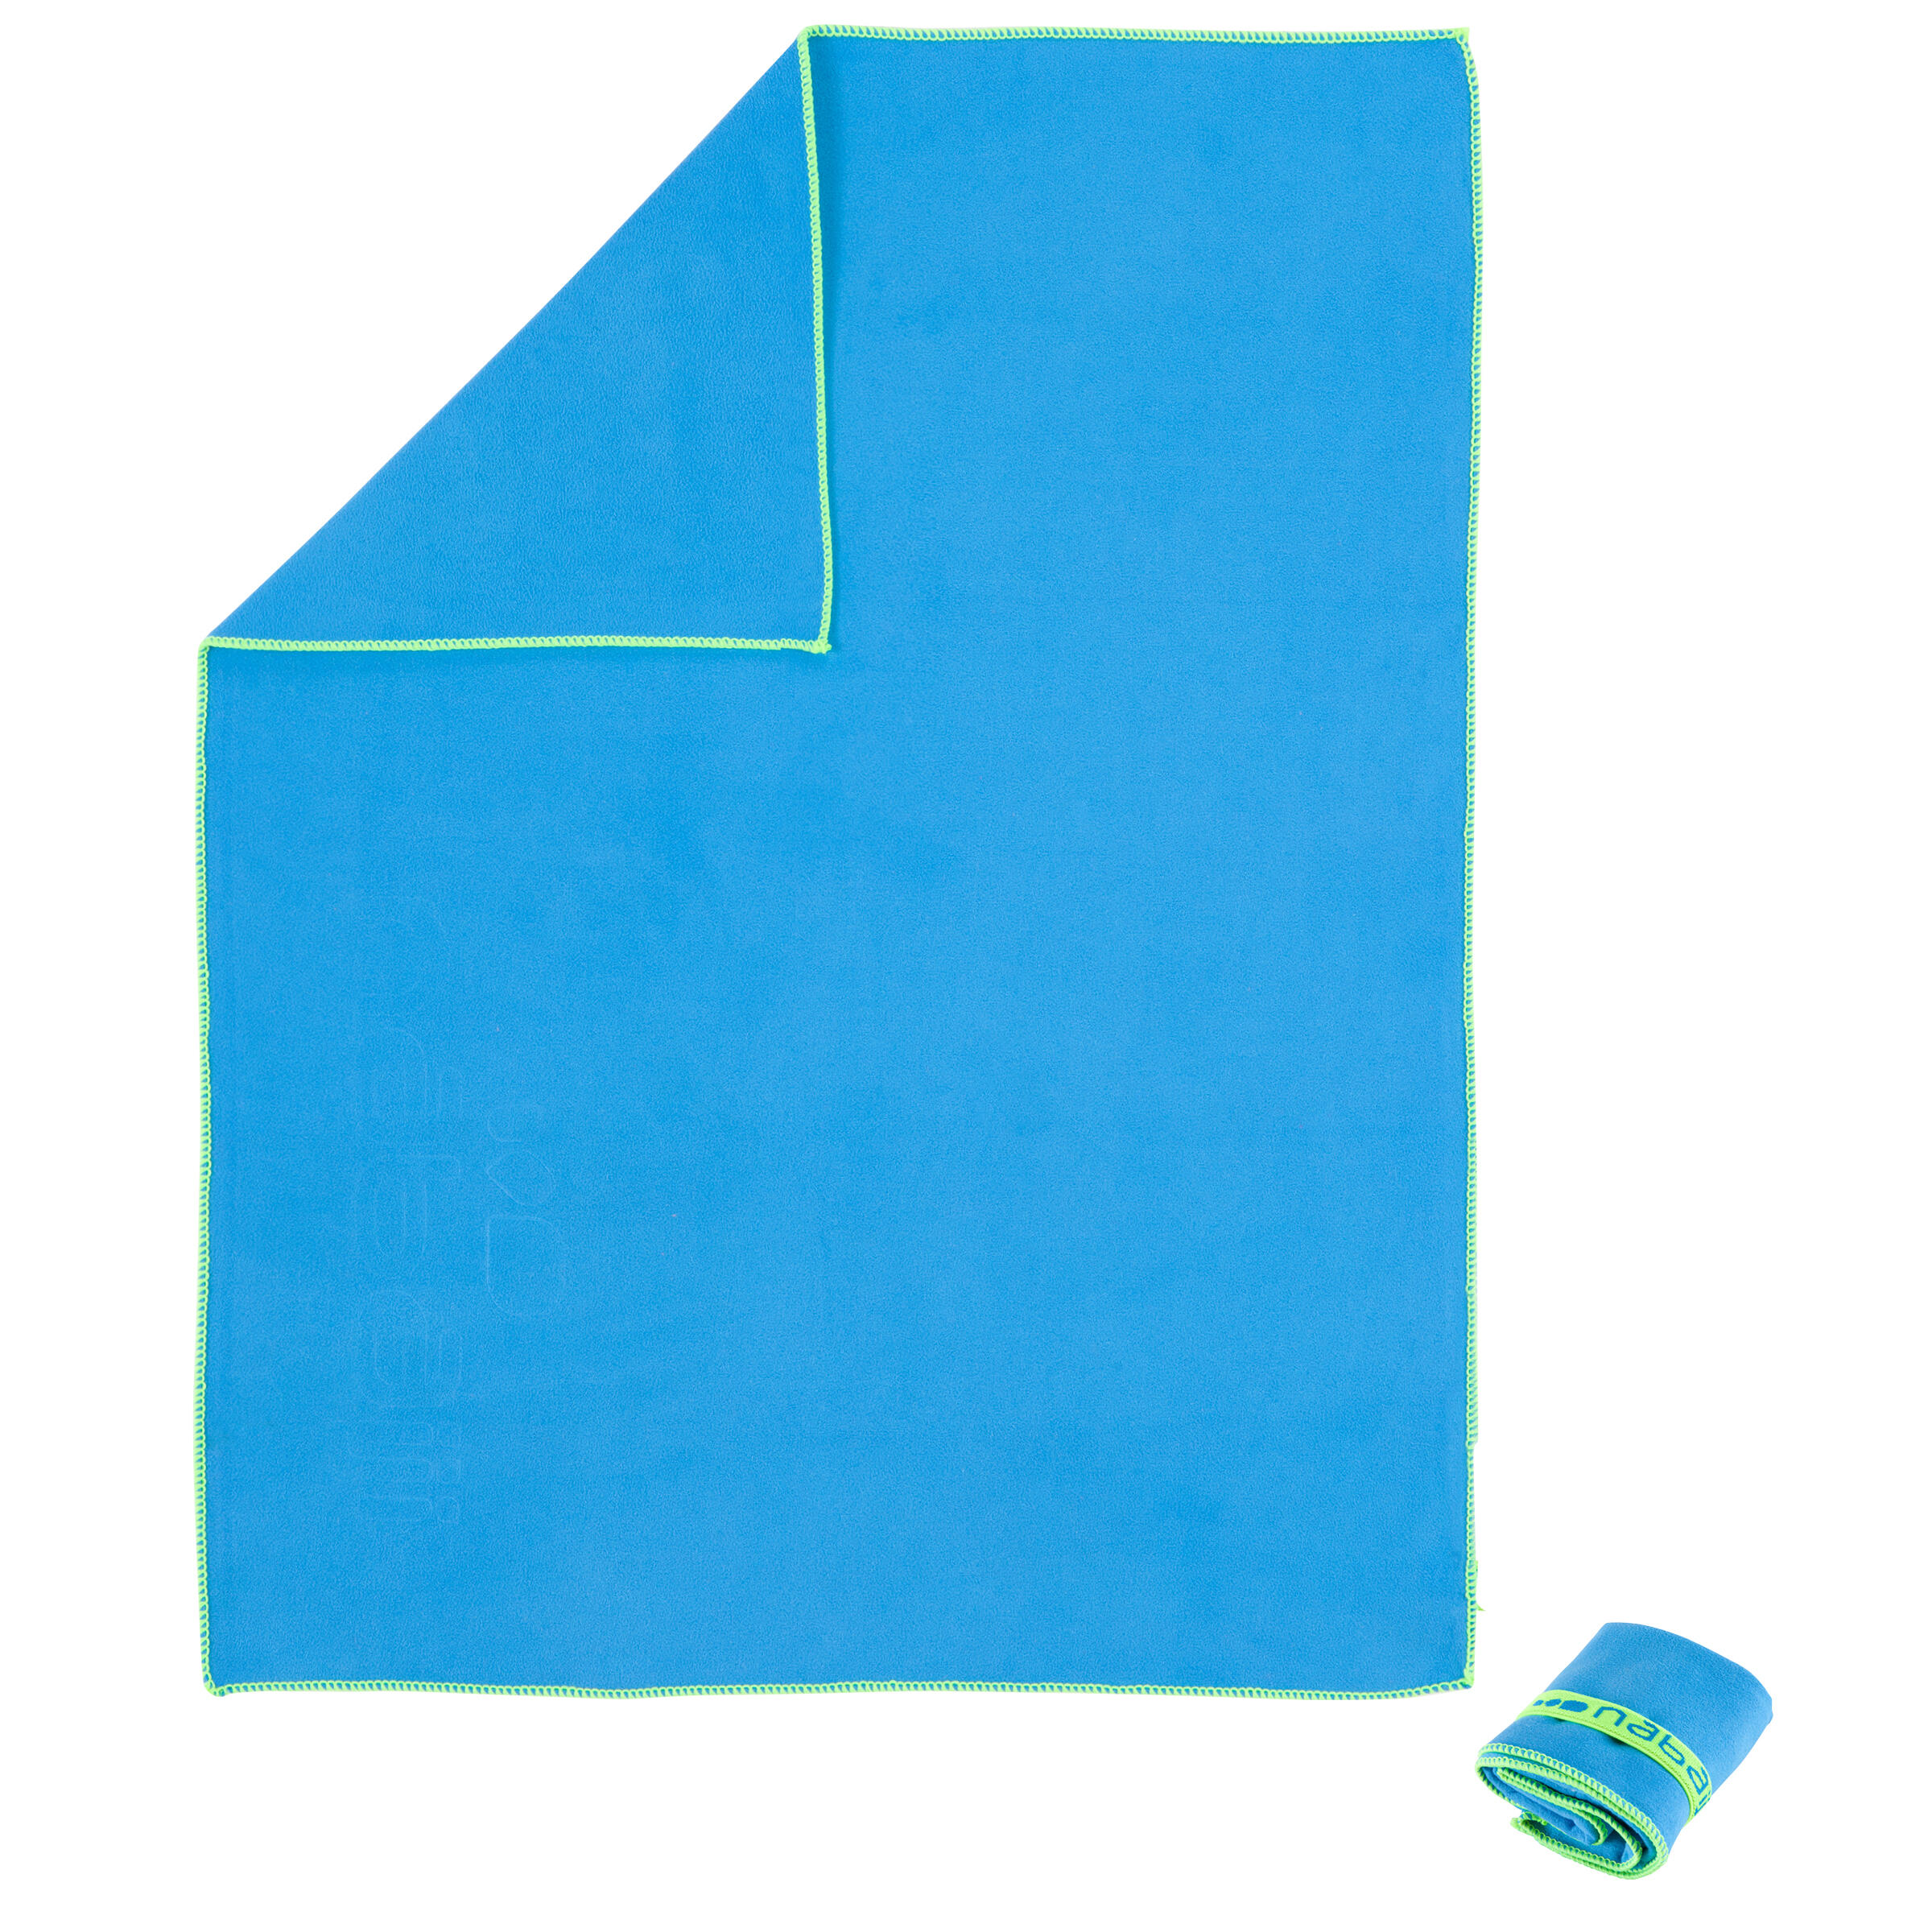 Toalla de microfibra azul talla CH 42 x 55 cm